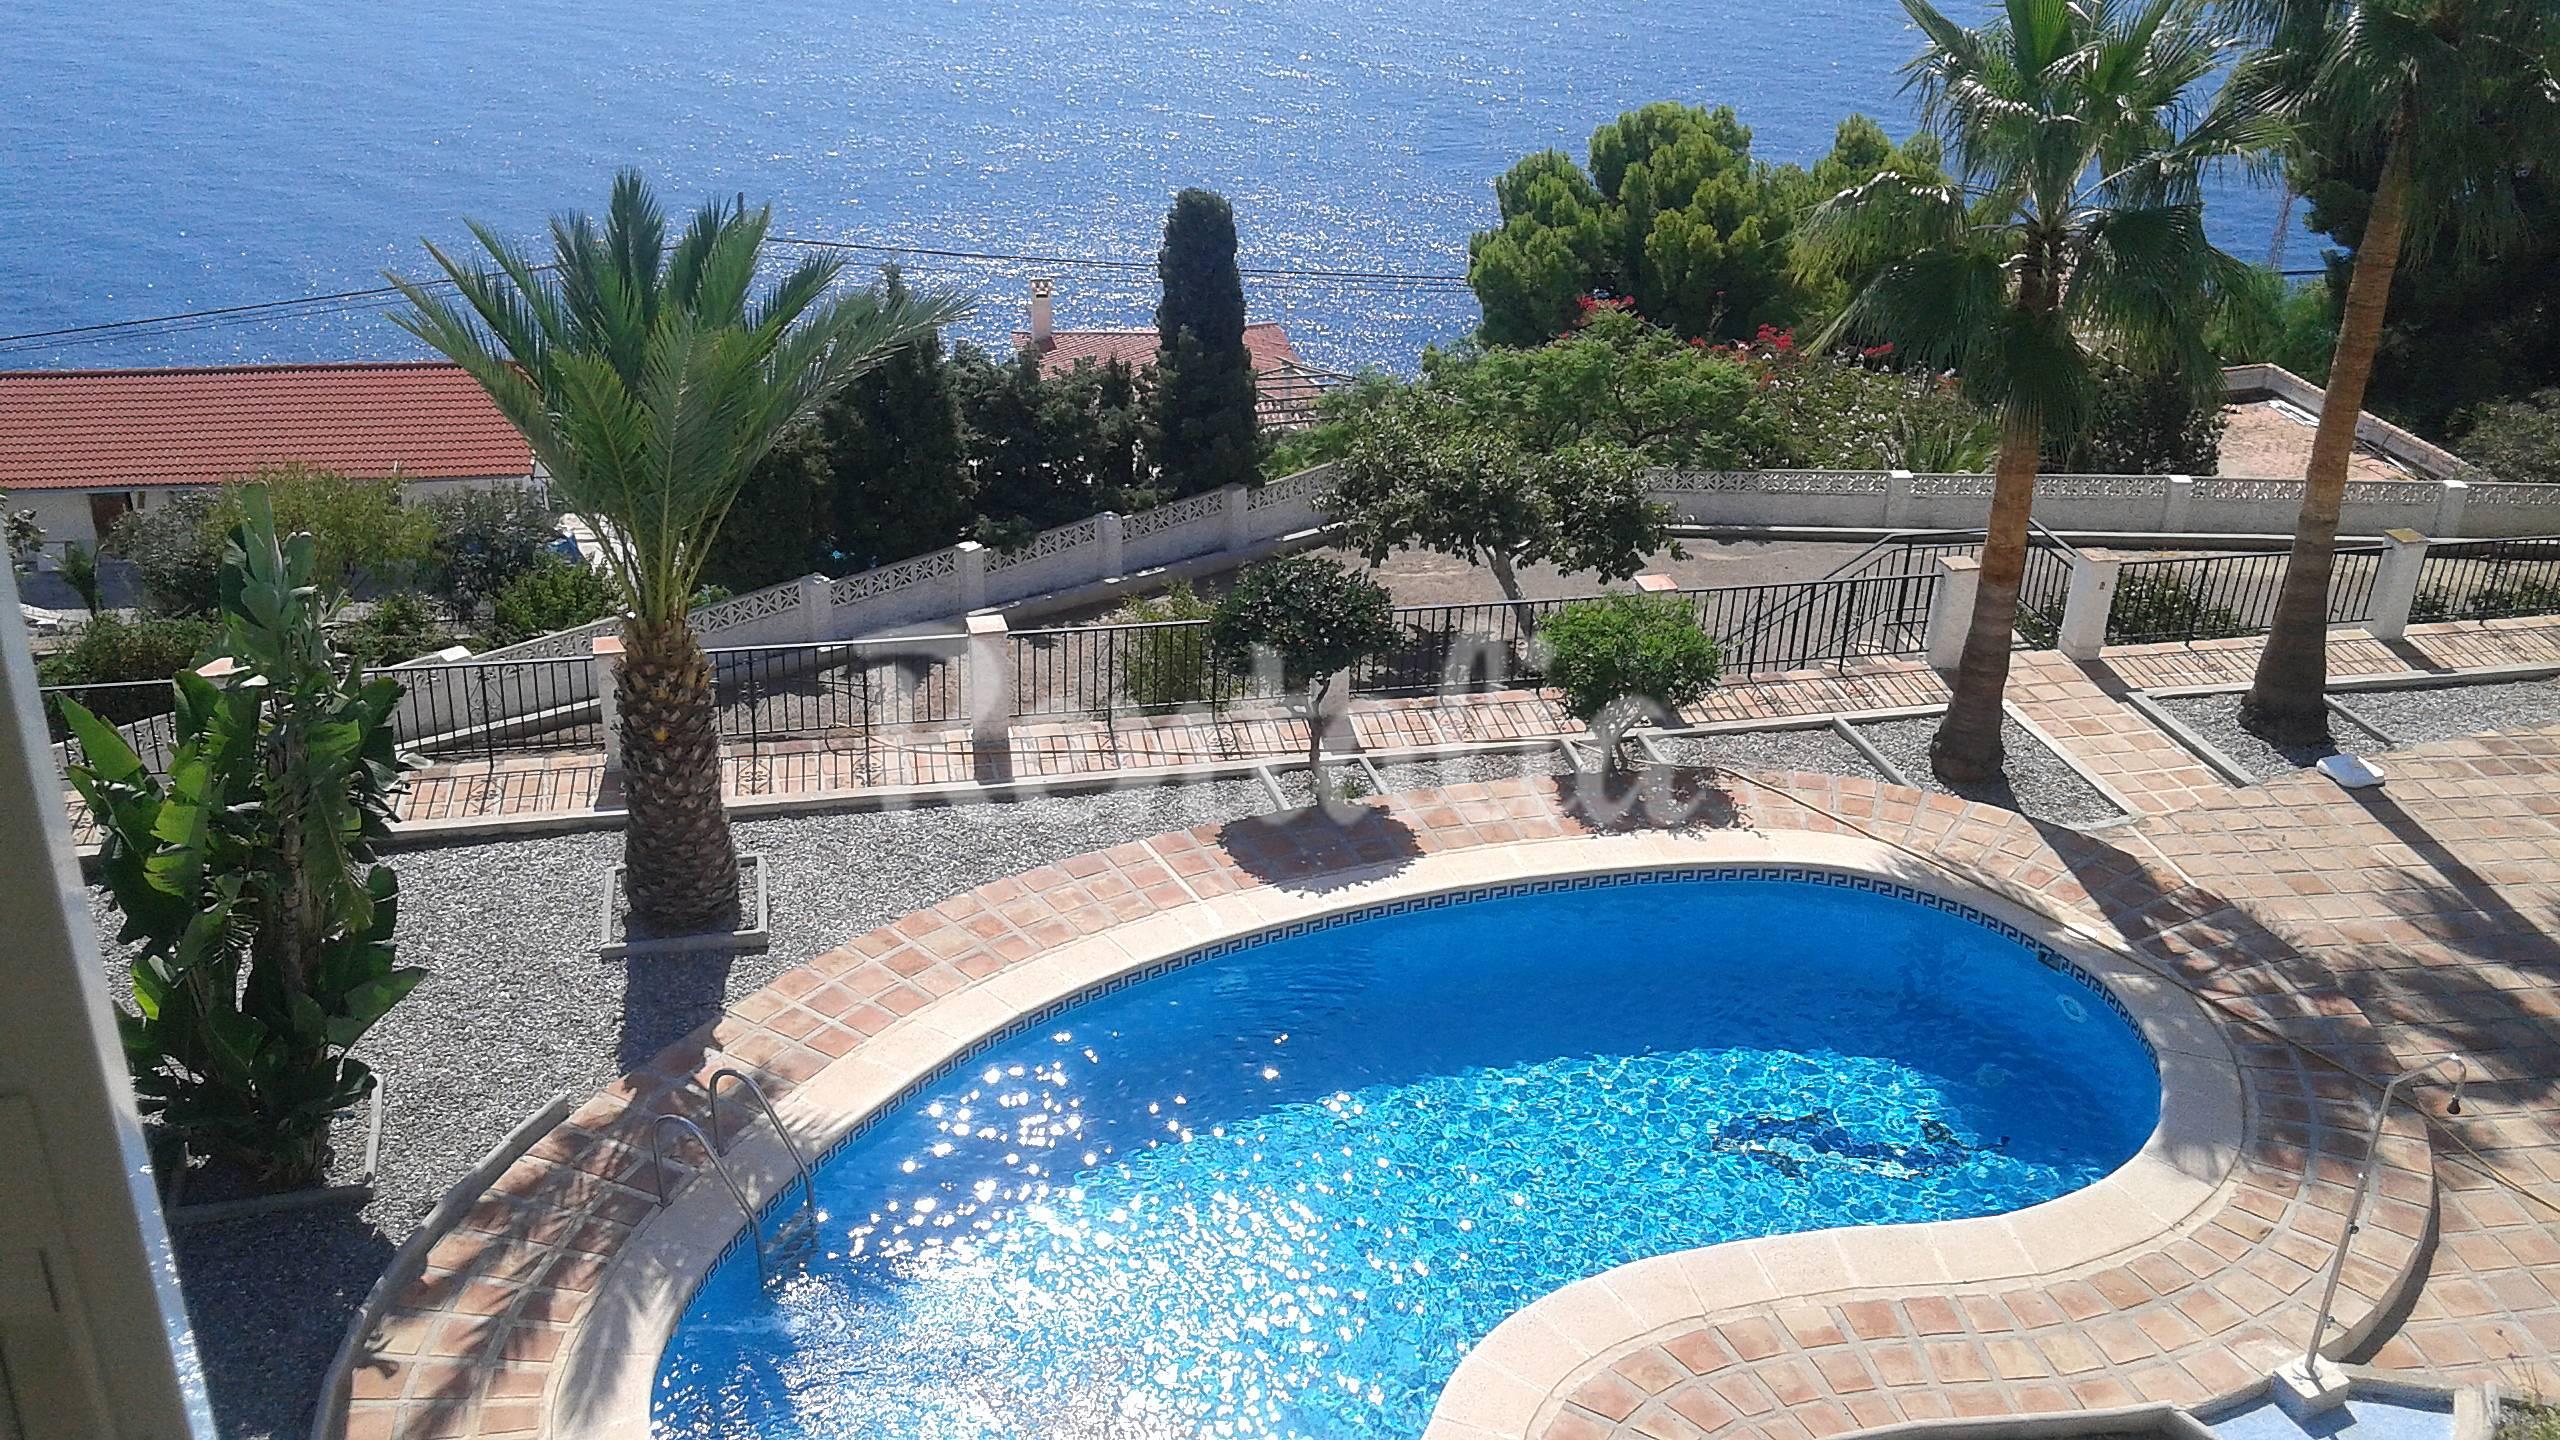 Villa con vista al mar y piscina salobre a granada for Piscina climatizada granada